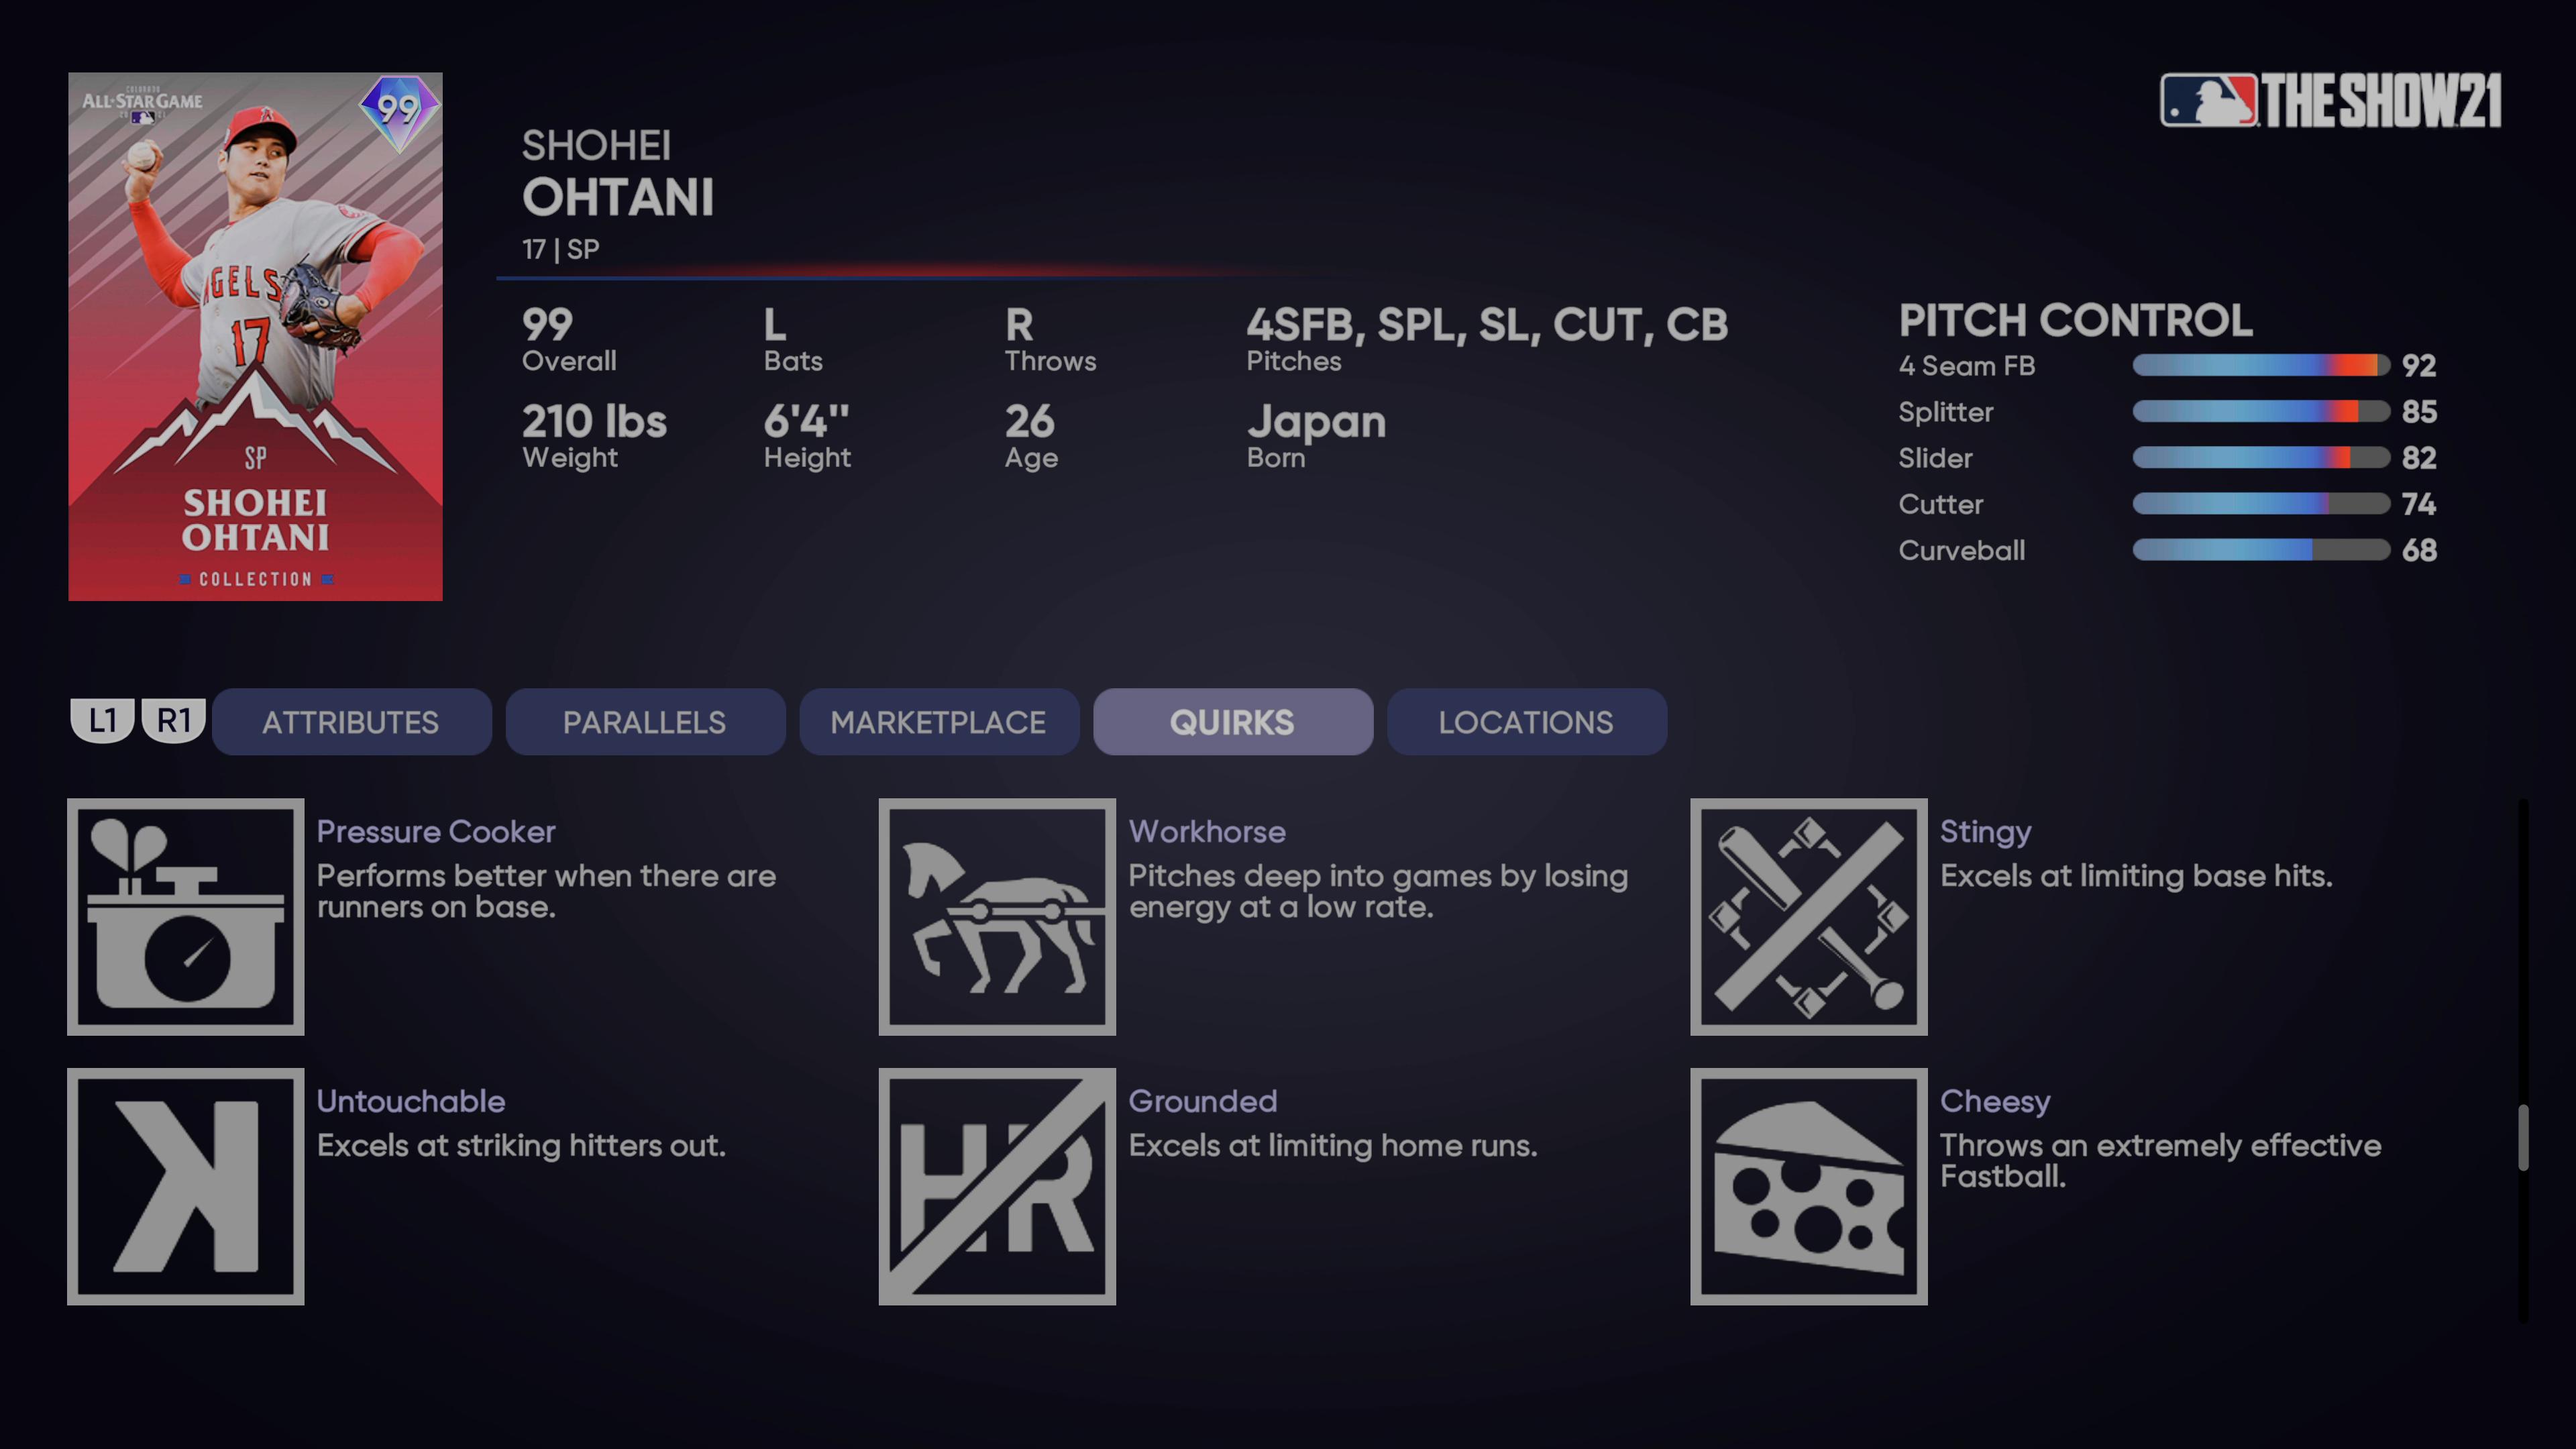 MLB The Show 21 - Home Run Derby_2021-07-13_02-07-54